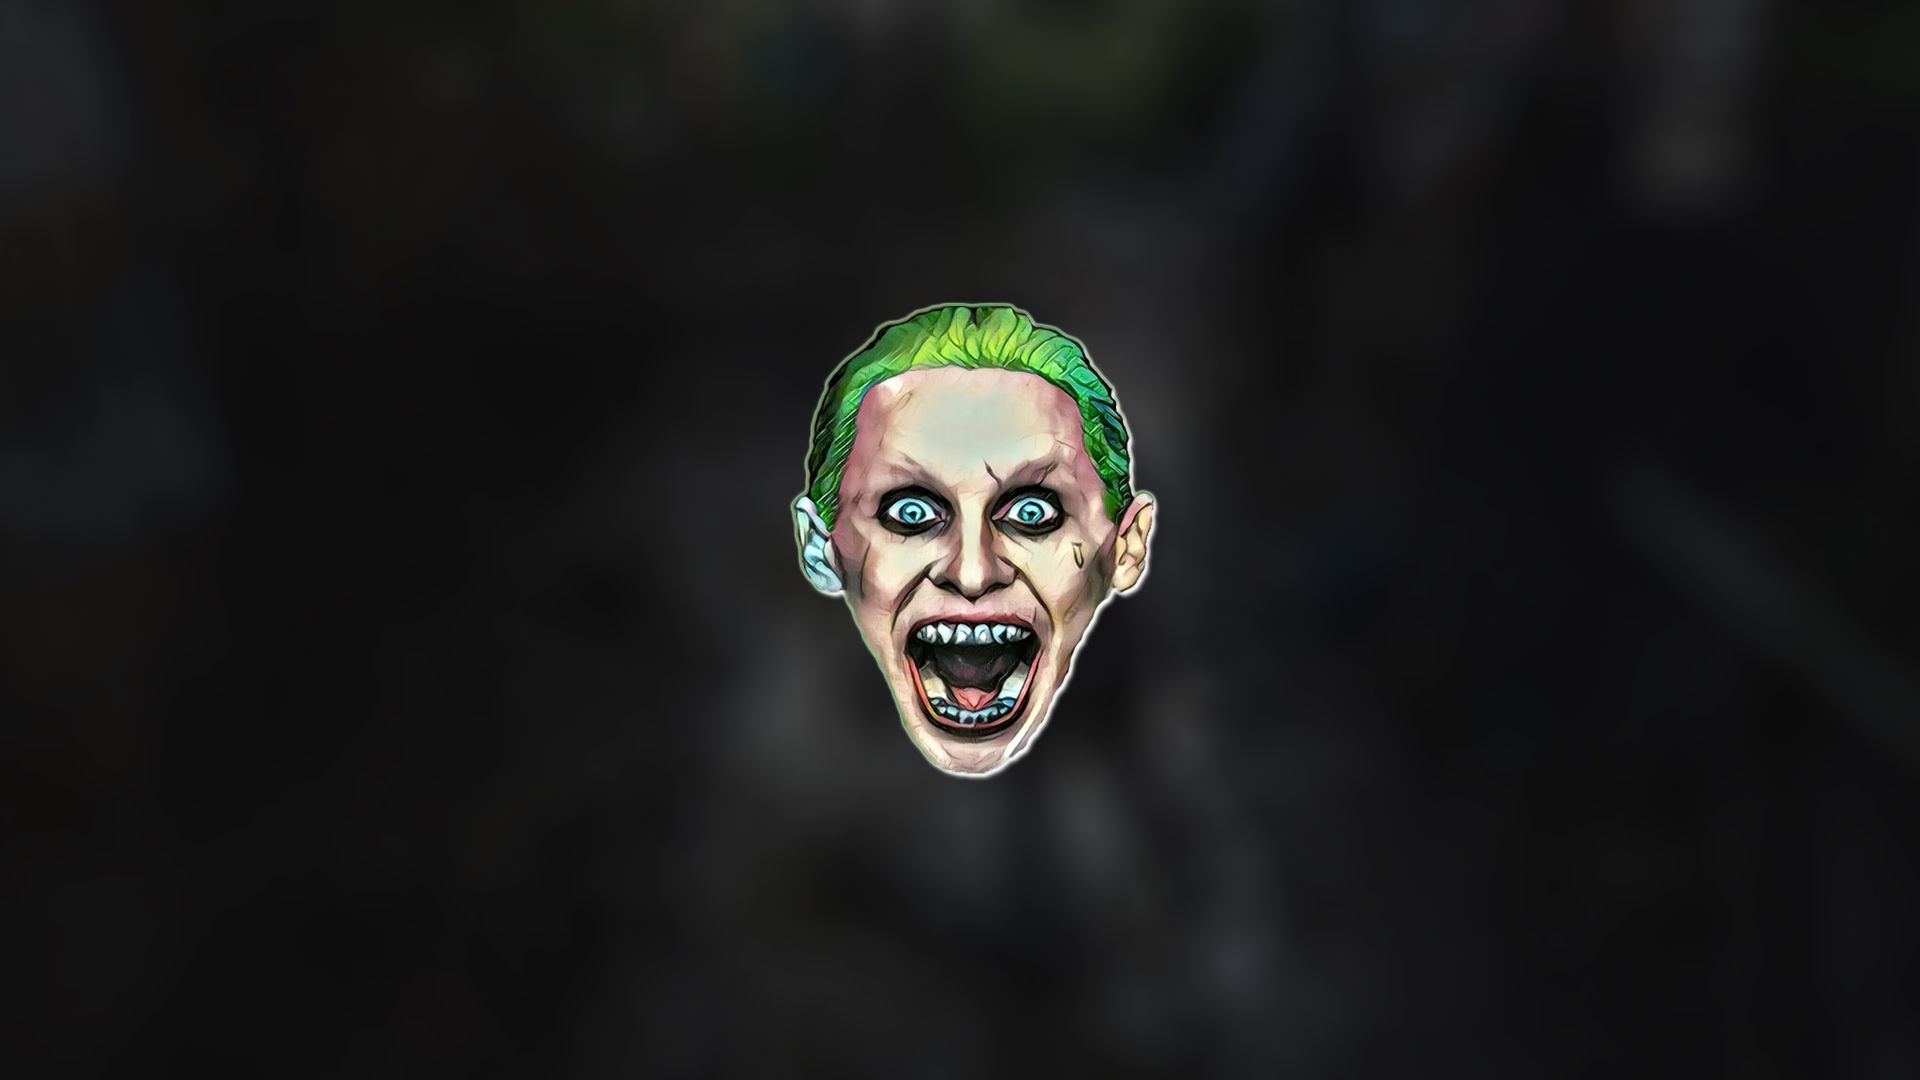 Suicide Squad Joker art, PC Wallpaper HD